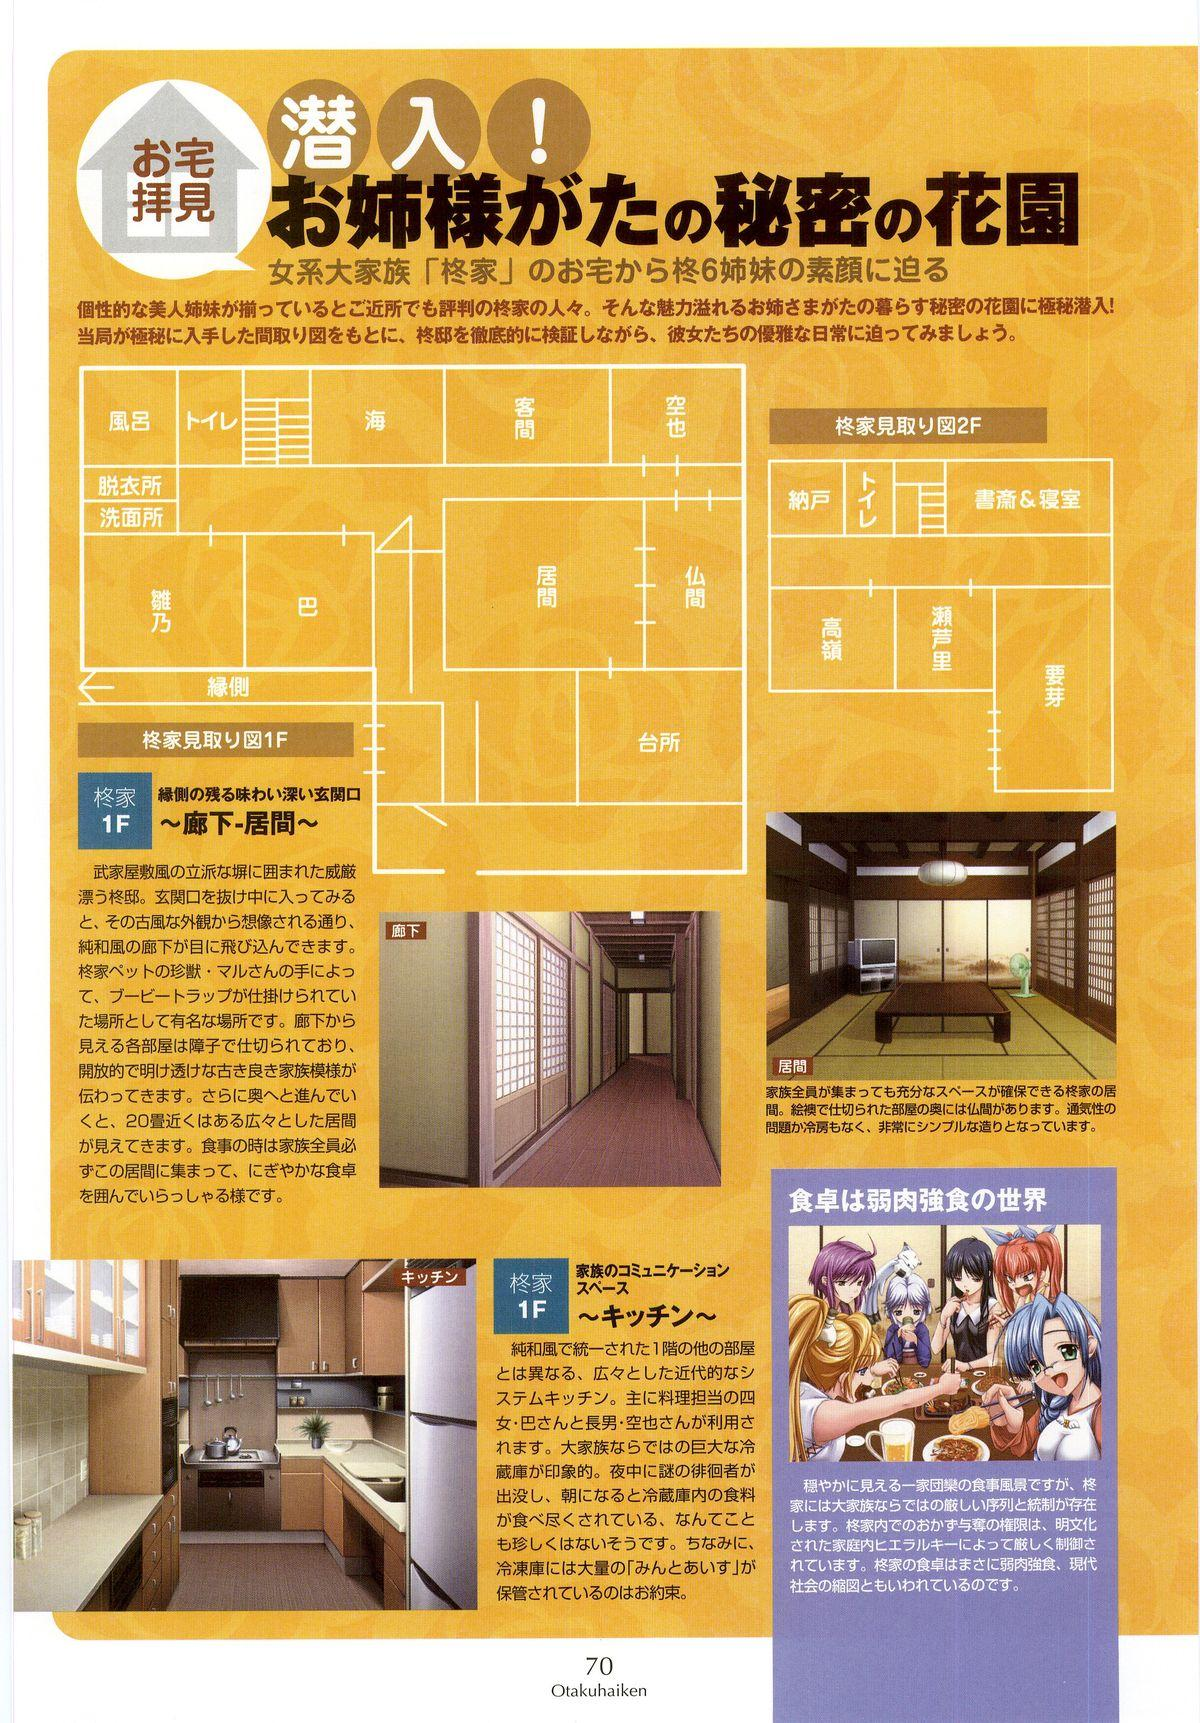 Nee, Chan to Shiyou yo! Koushiki Fanbook - Ai to Batou no Hibi 61